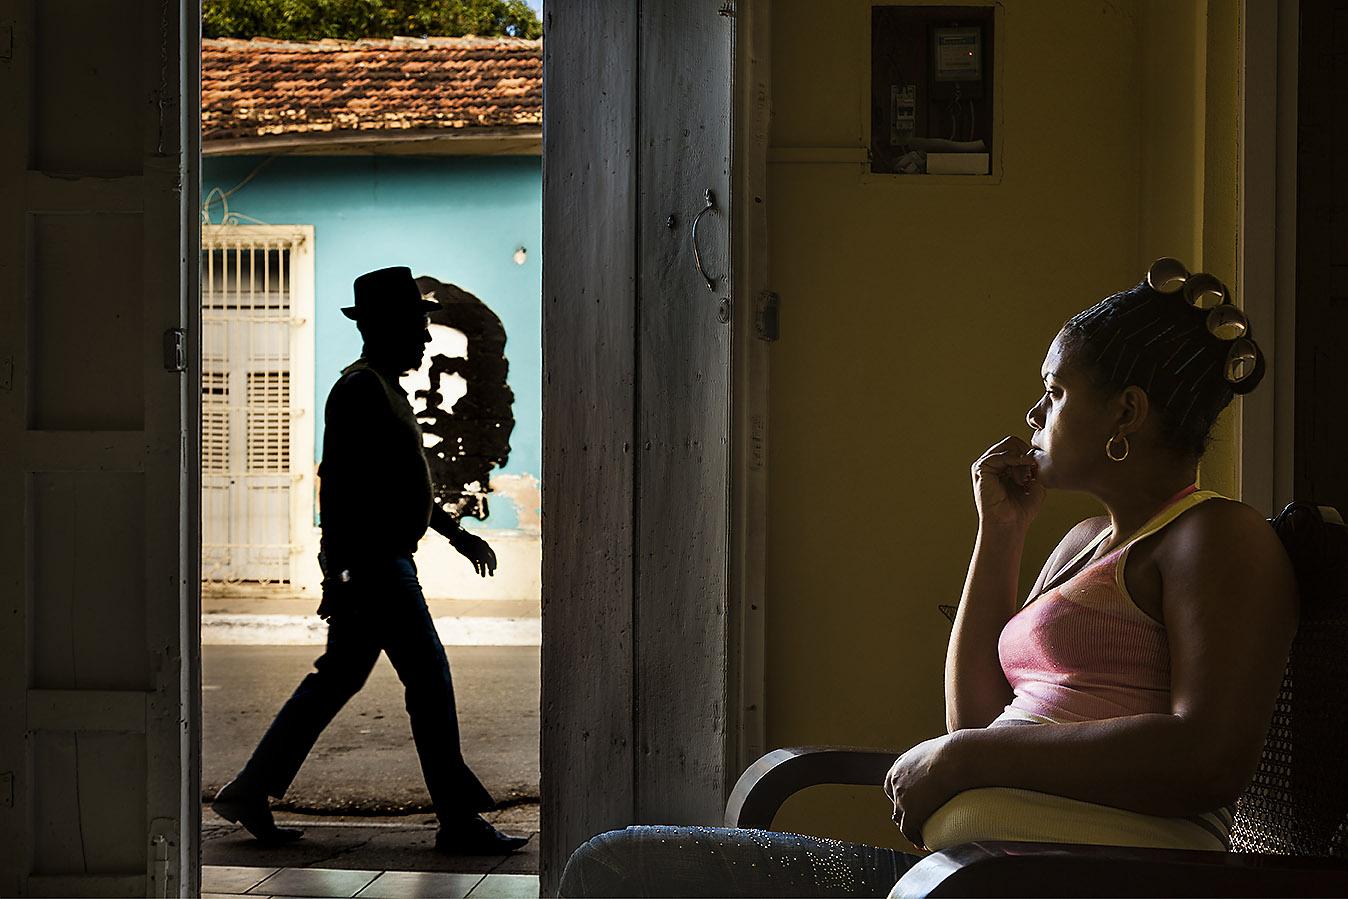 Cuba, Trinidad: murale di Che Guevara in calle camilo cienfuegos. Foto di Vittorio Sciosia